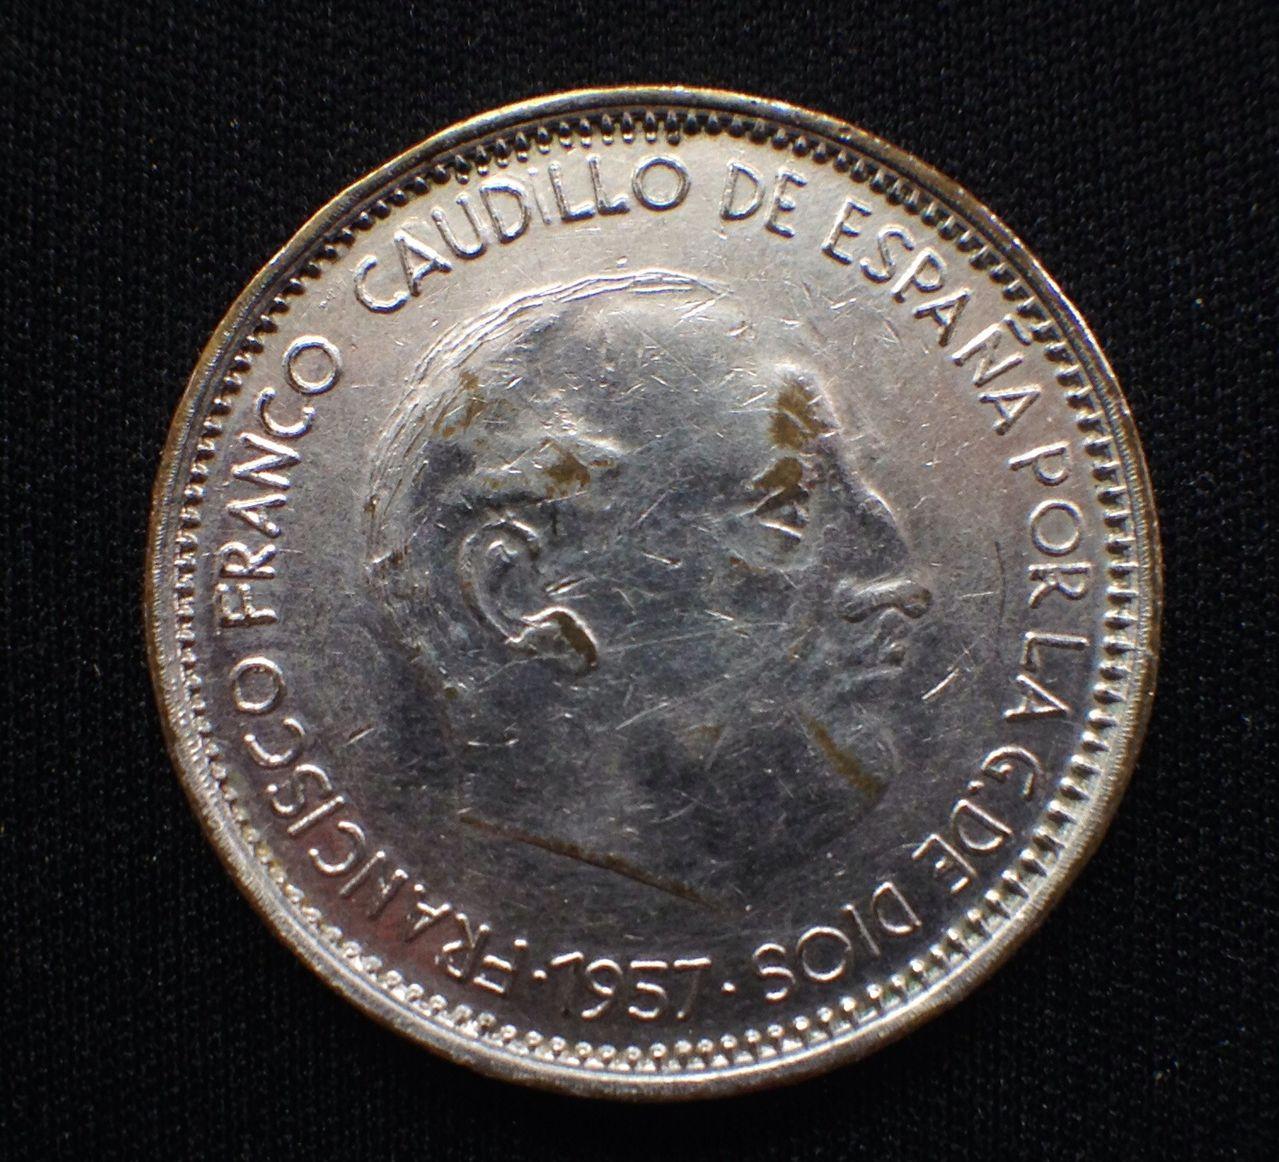 50 pesetas 1957*74. Estado español Image